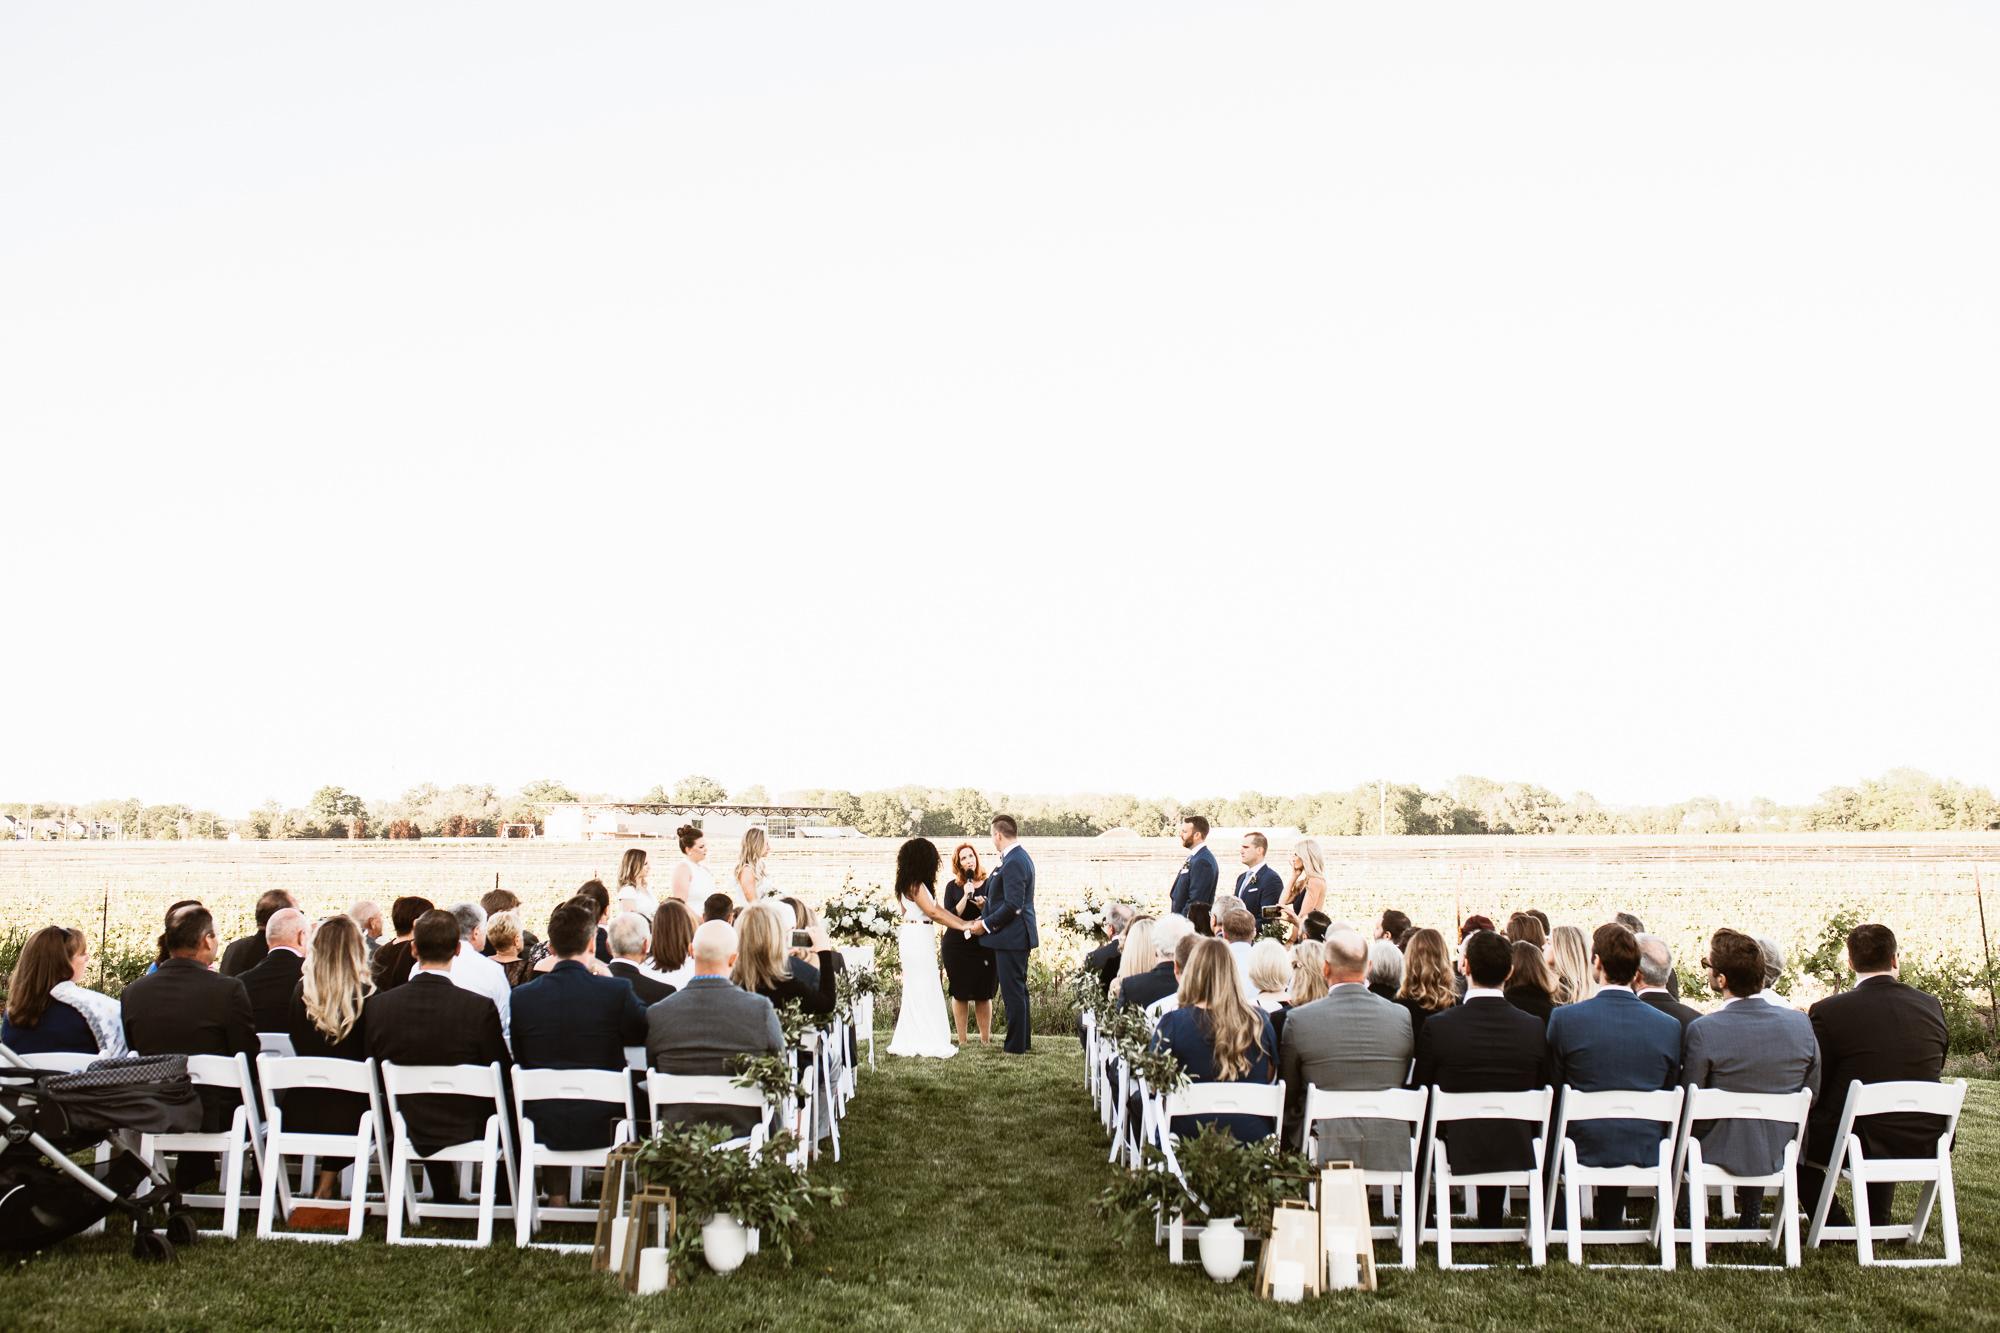 stratus-winery-wedding-vineyard-wedding-vineyard-bride-photo-by-reed-photography-041.jpg